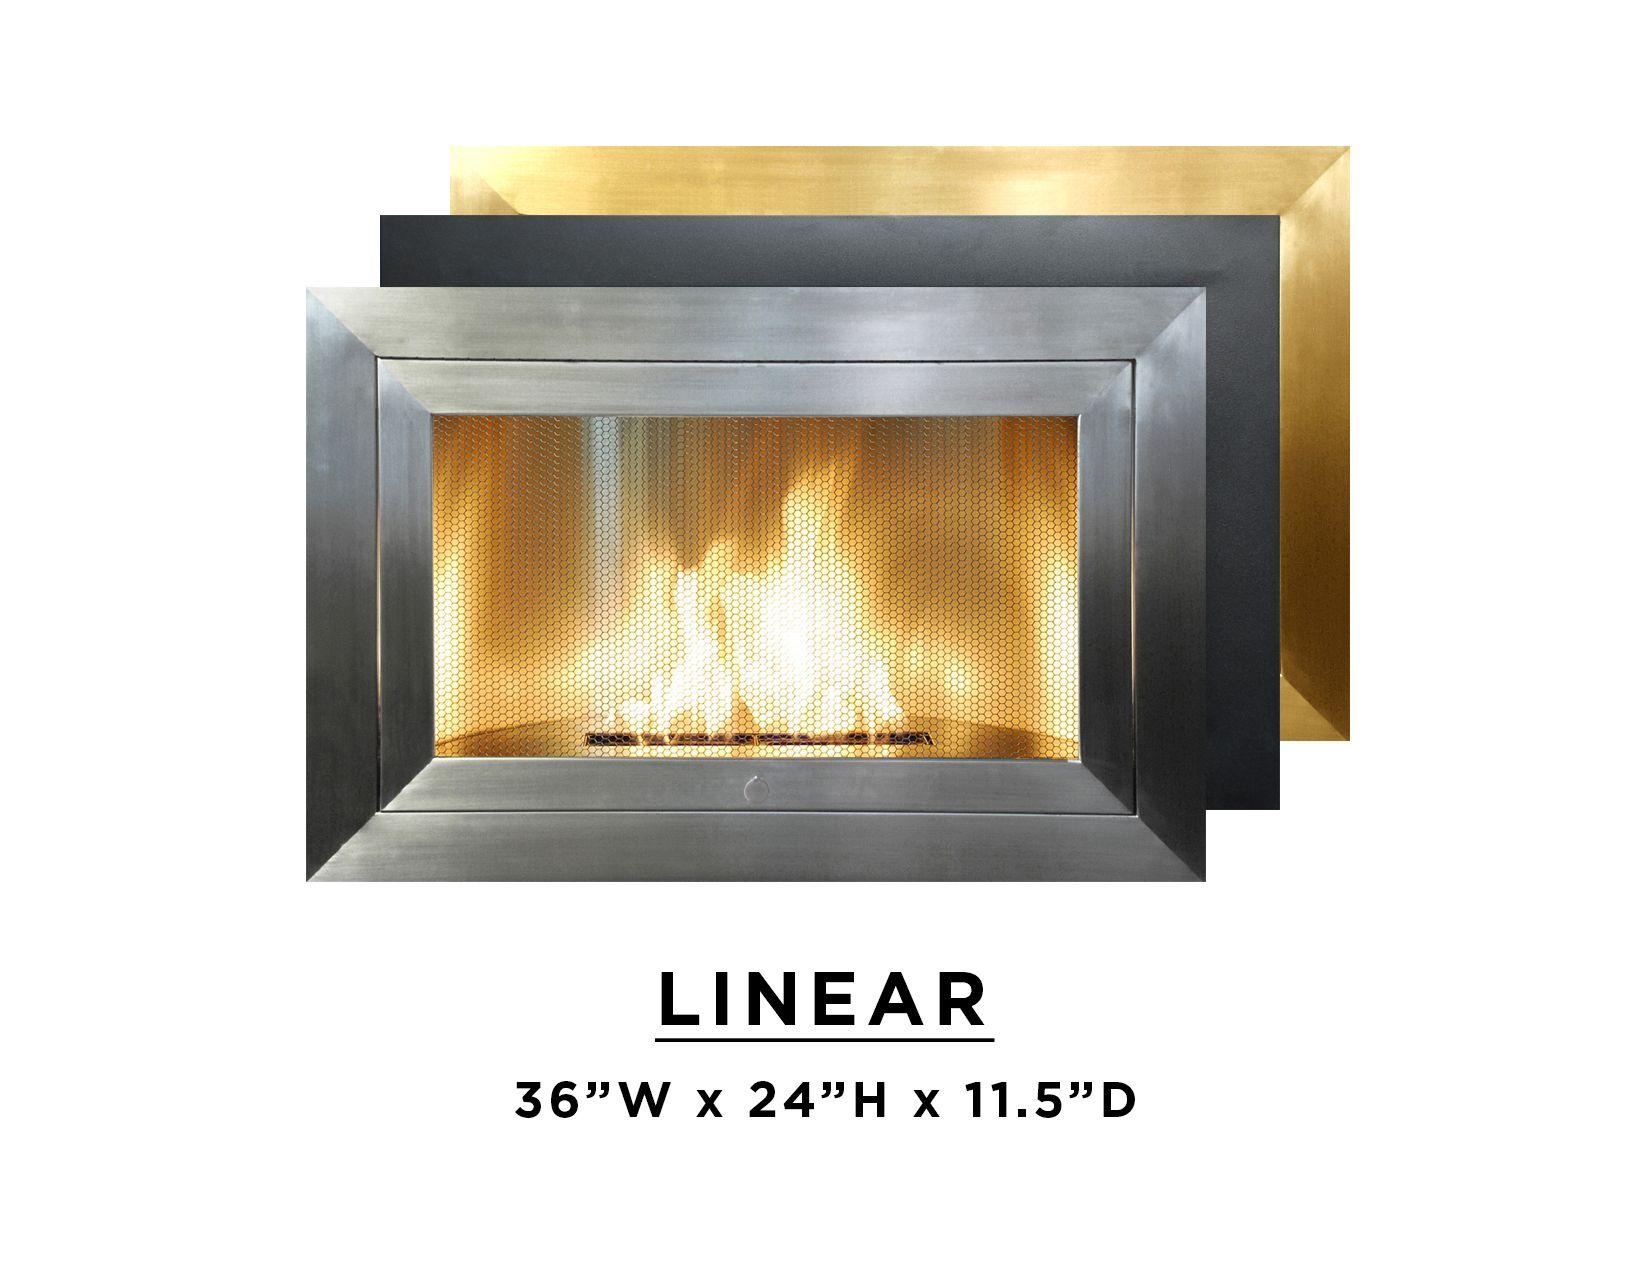 Ventless Alcohol Gel Fuel Cartridges Fireplaces Made In Ny Ventless Fireplace Linear Fireplace Fireplace